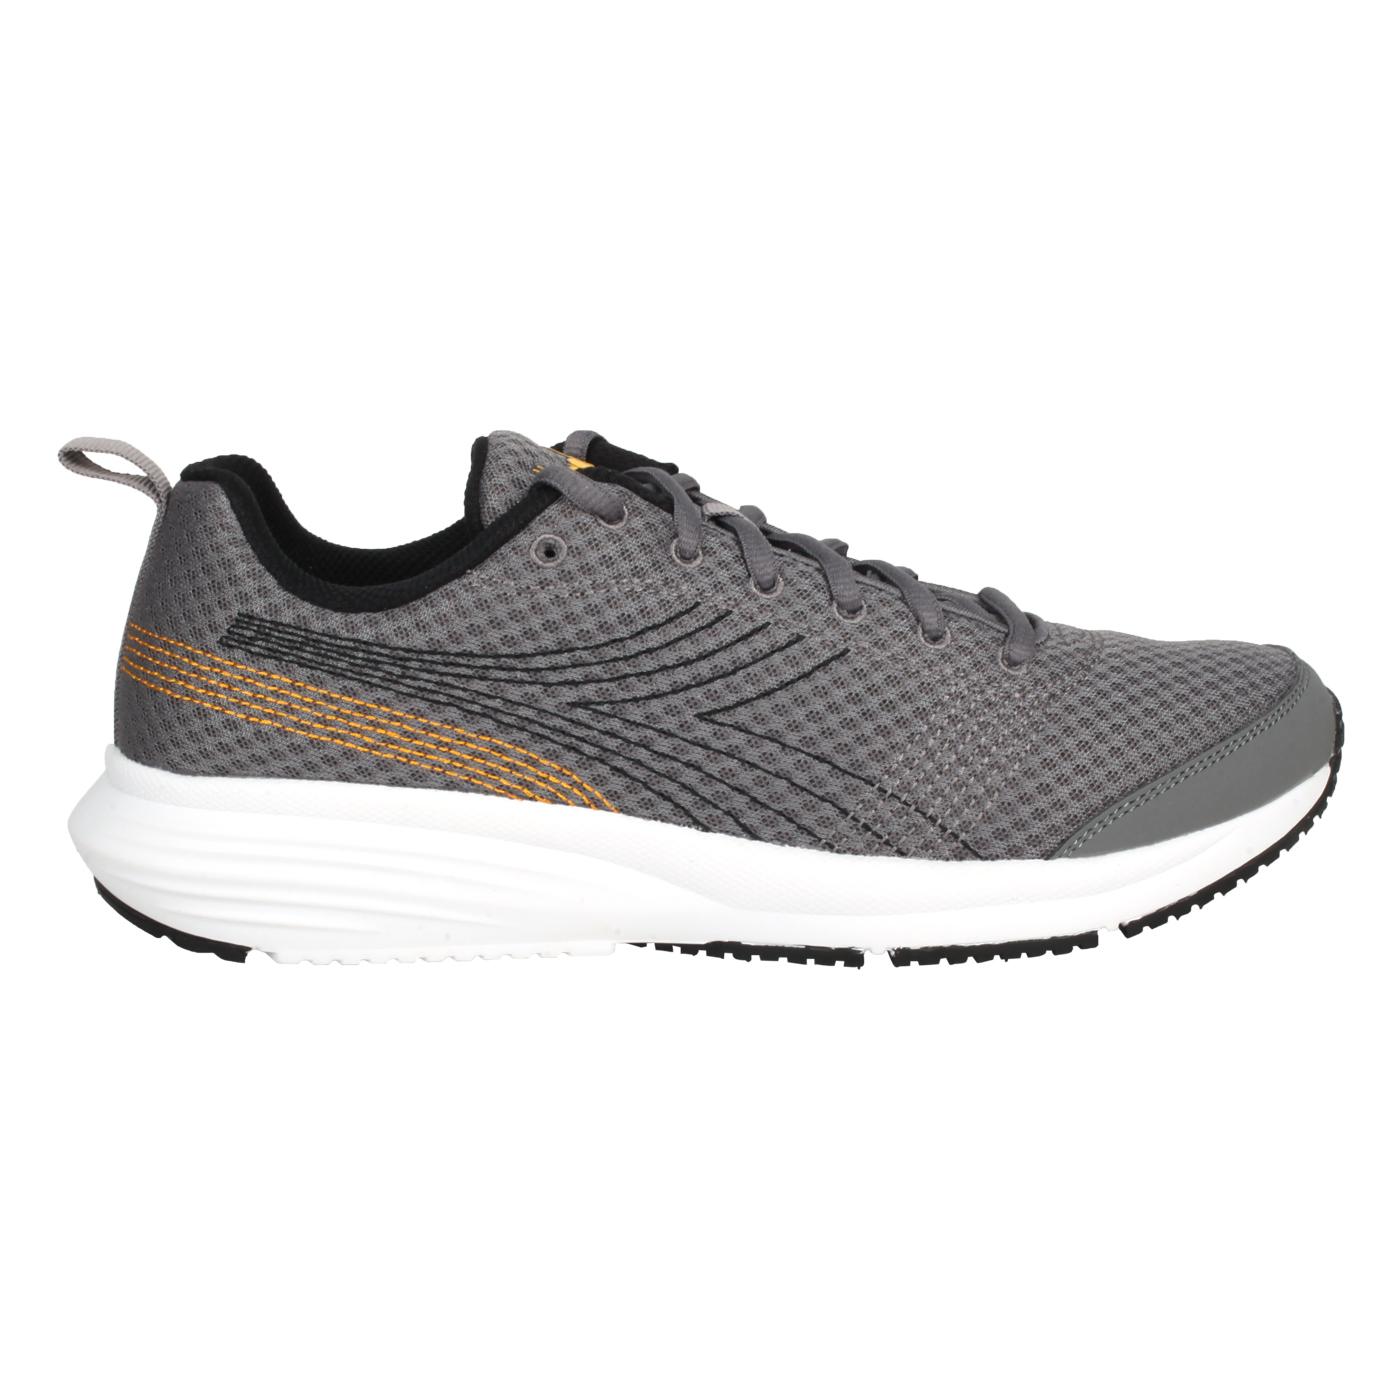 DIADORA 男款進口慢跑鞋 DA176877-C9081